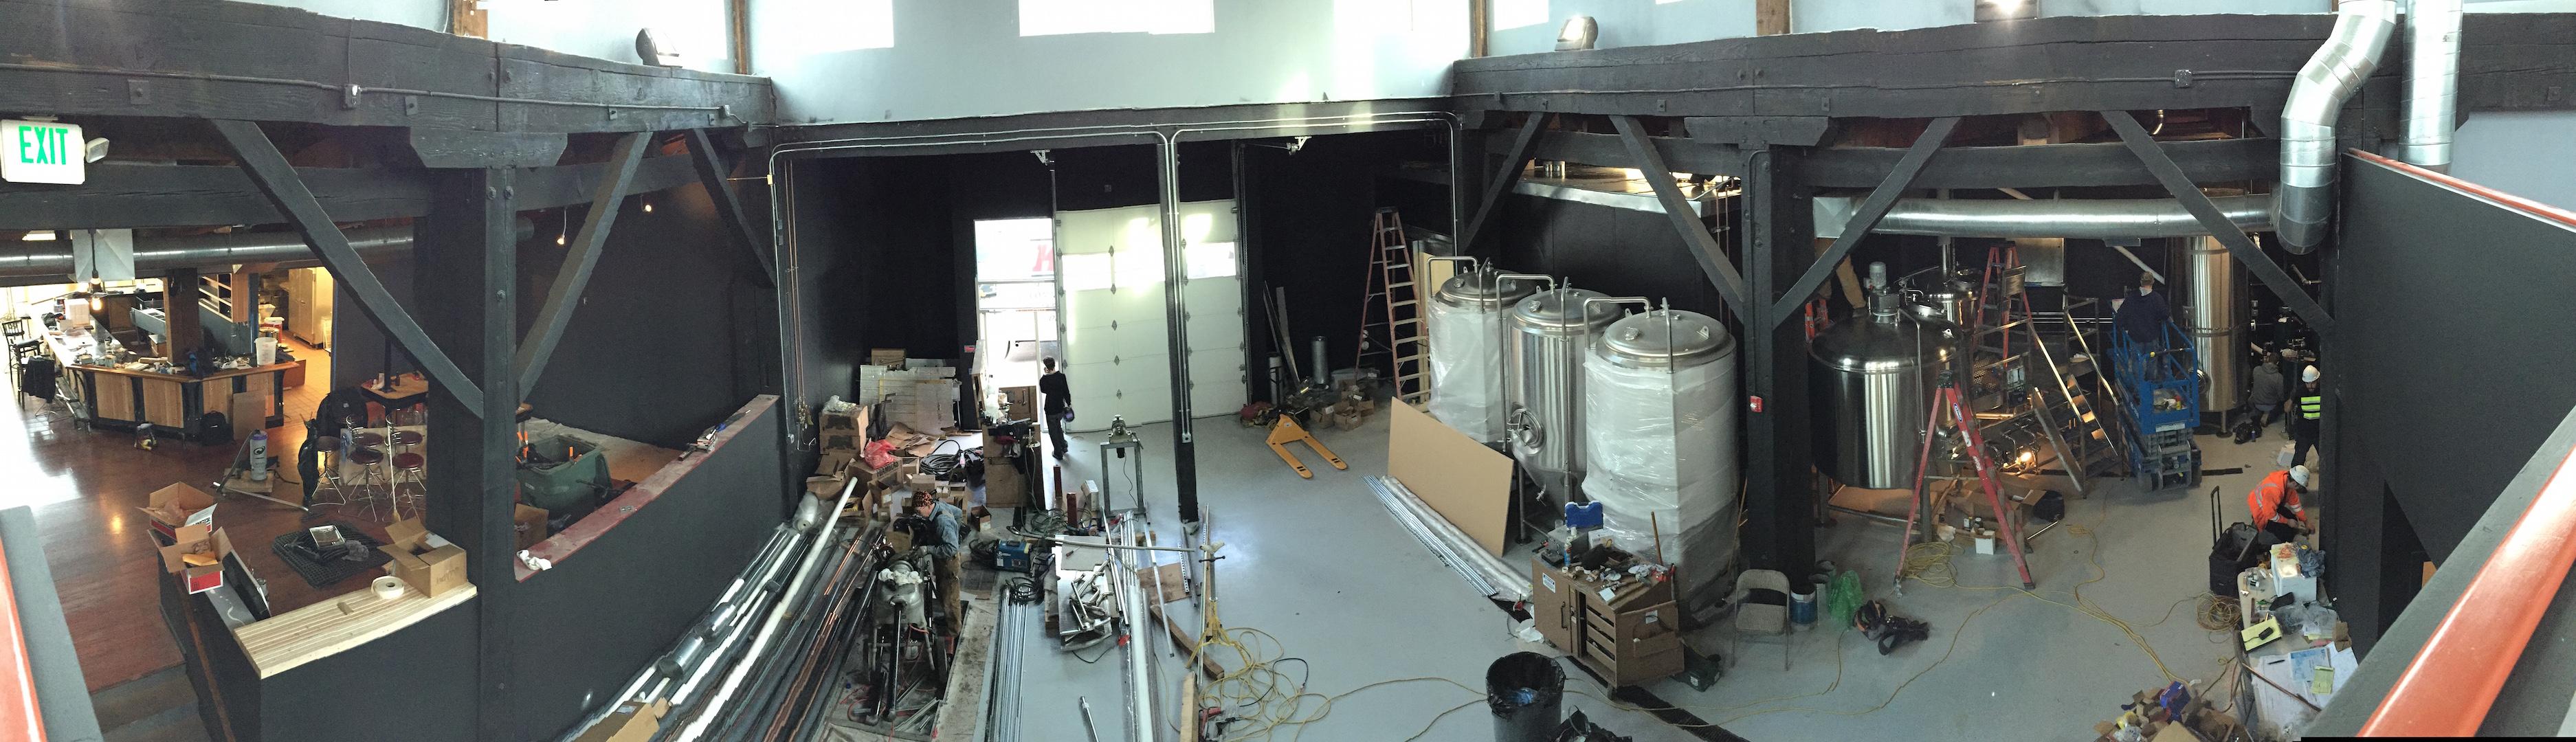 Ghostfish Brewery Progress Update 2014